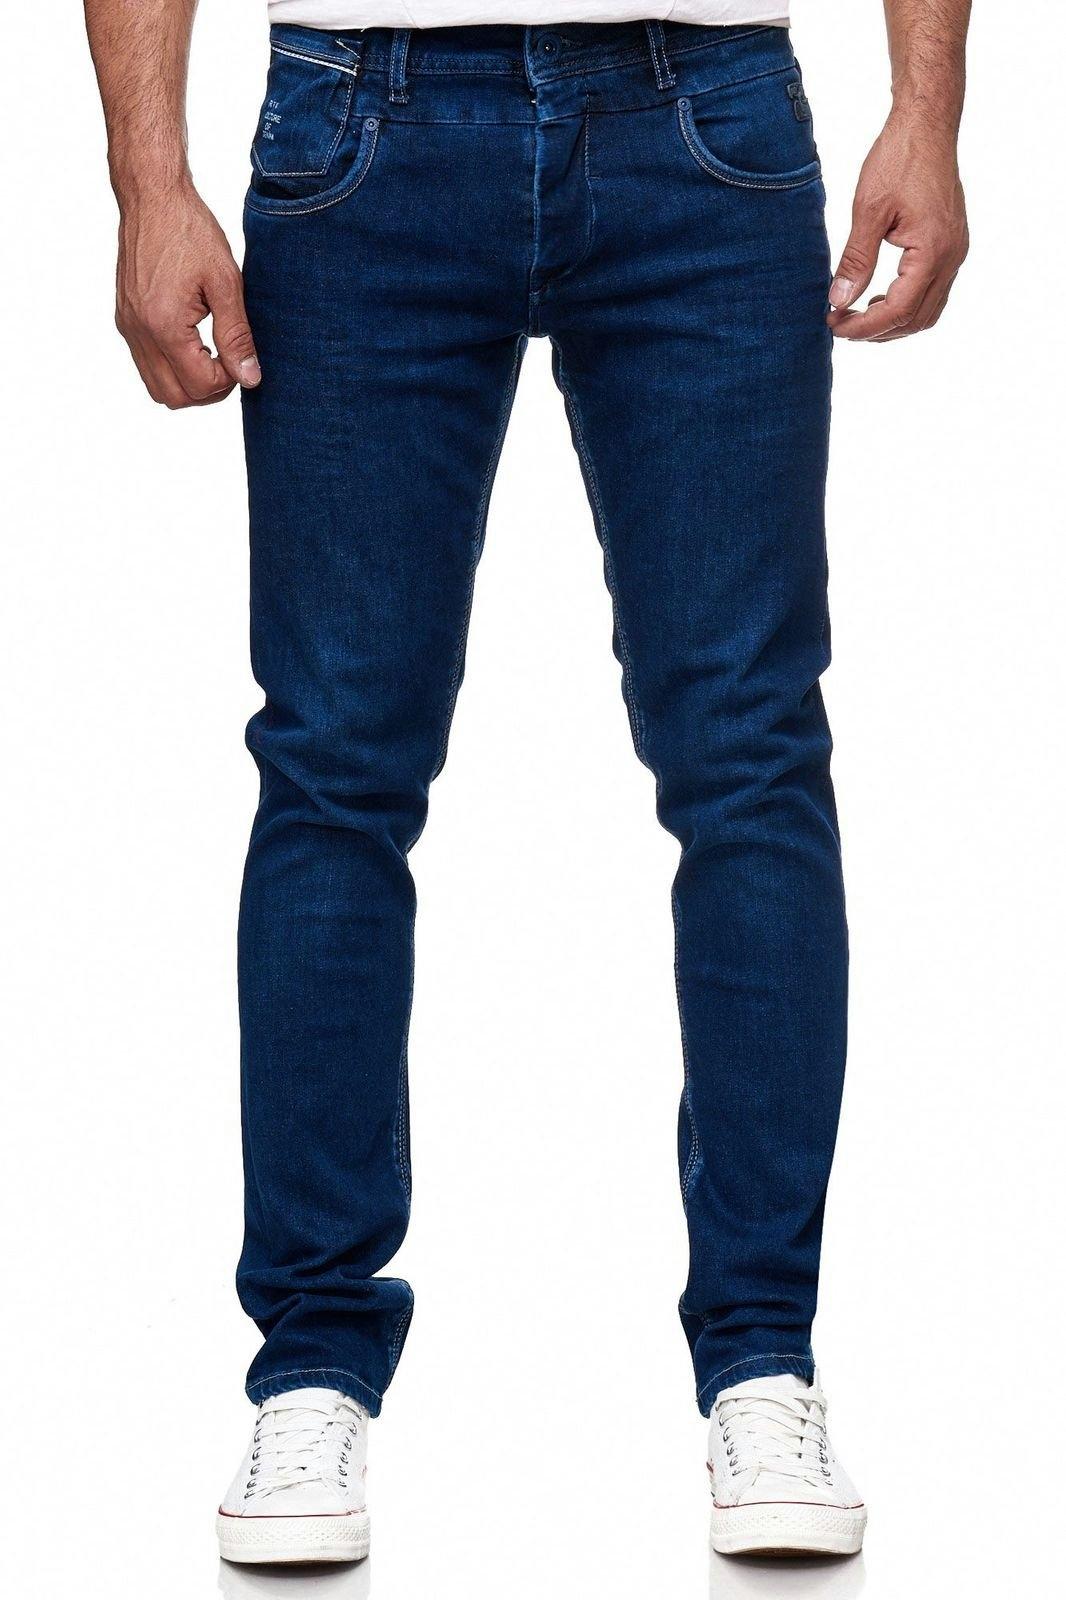 Rusty Neal Jeans goedkoop op otto.nl kopen